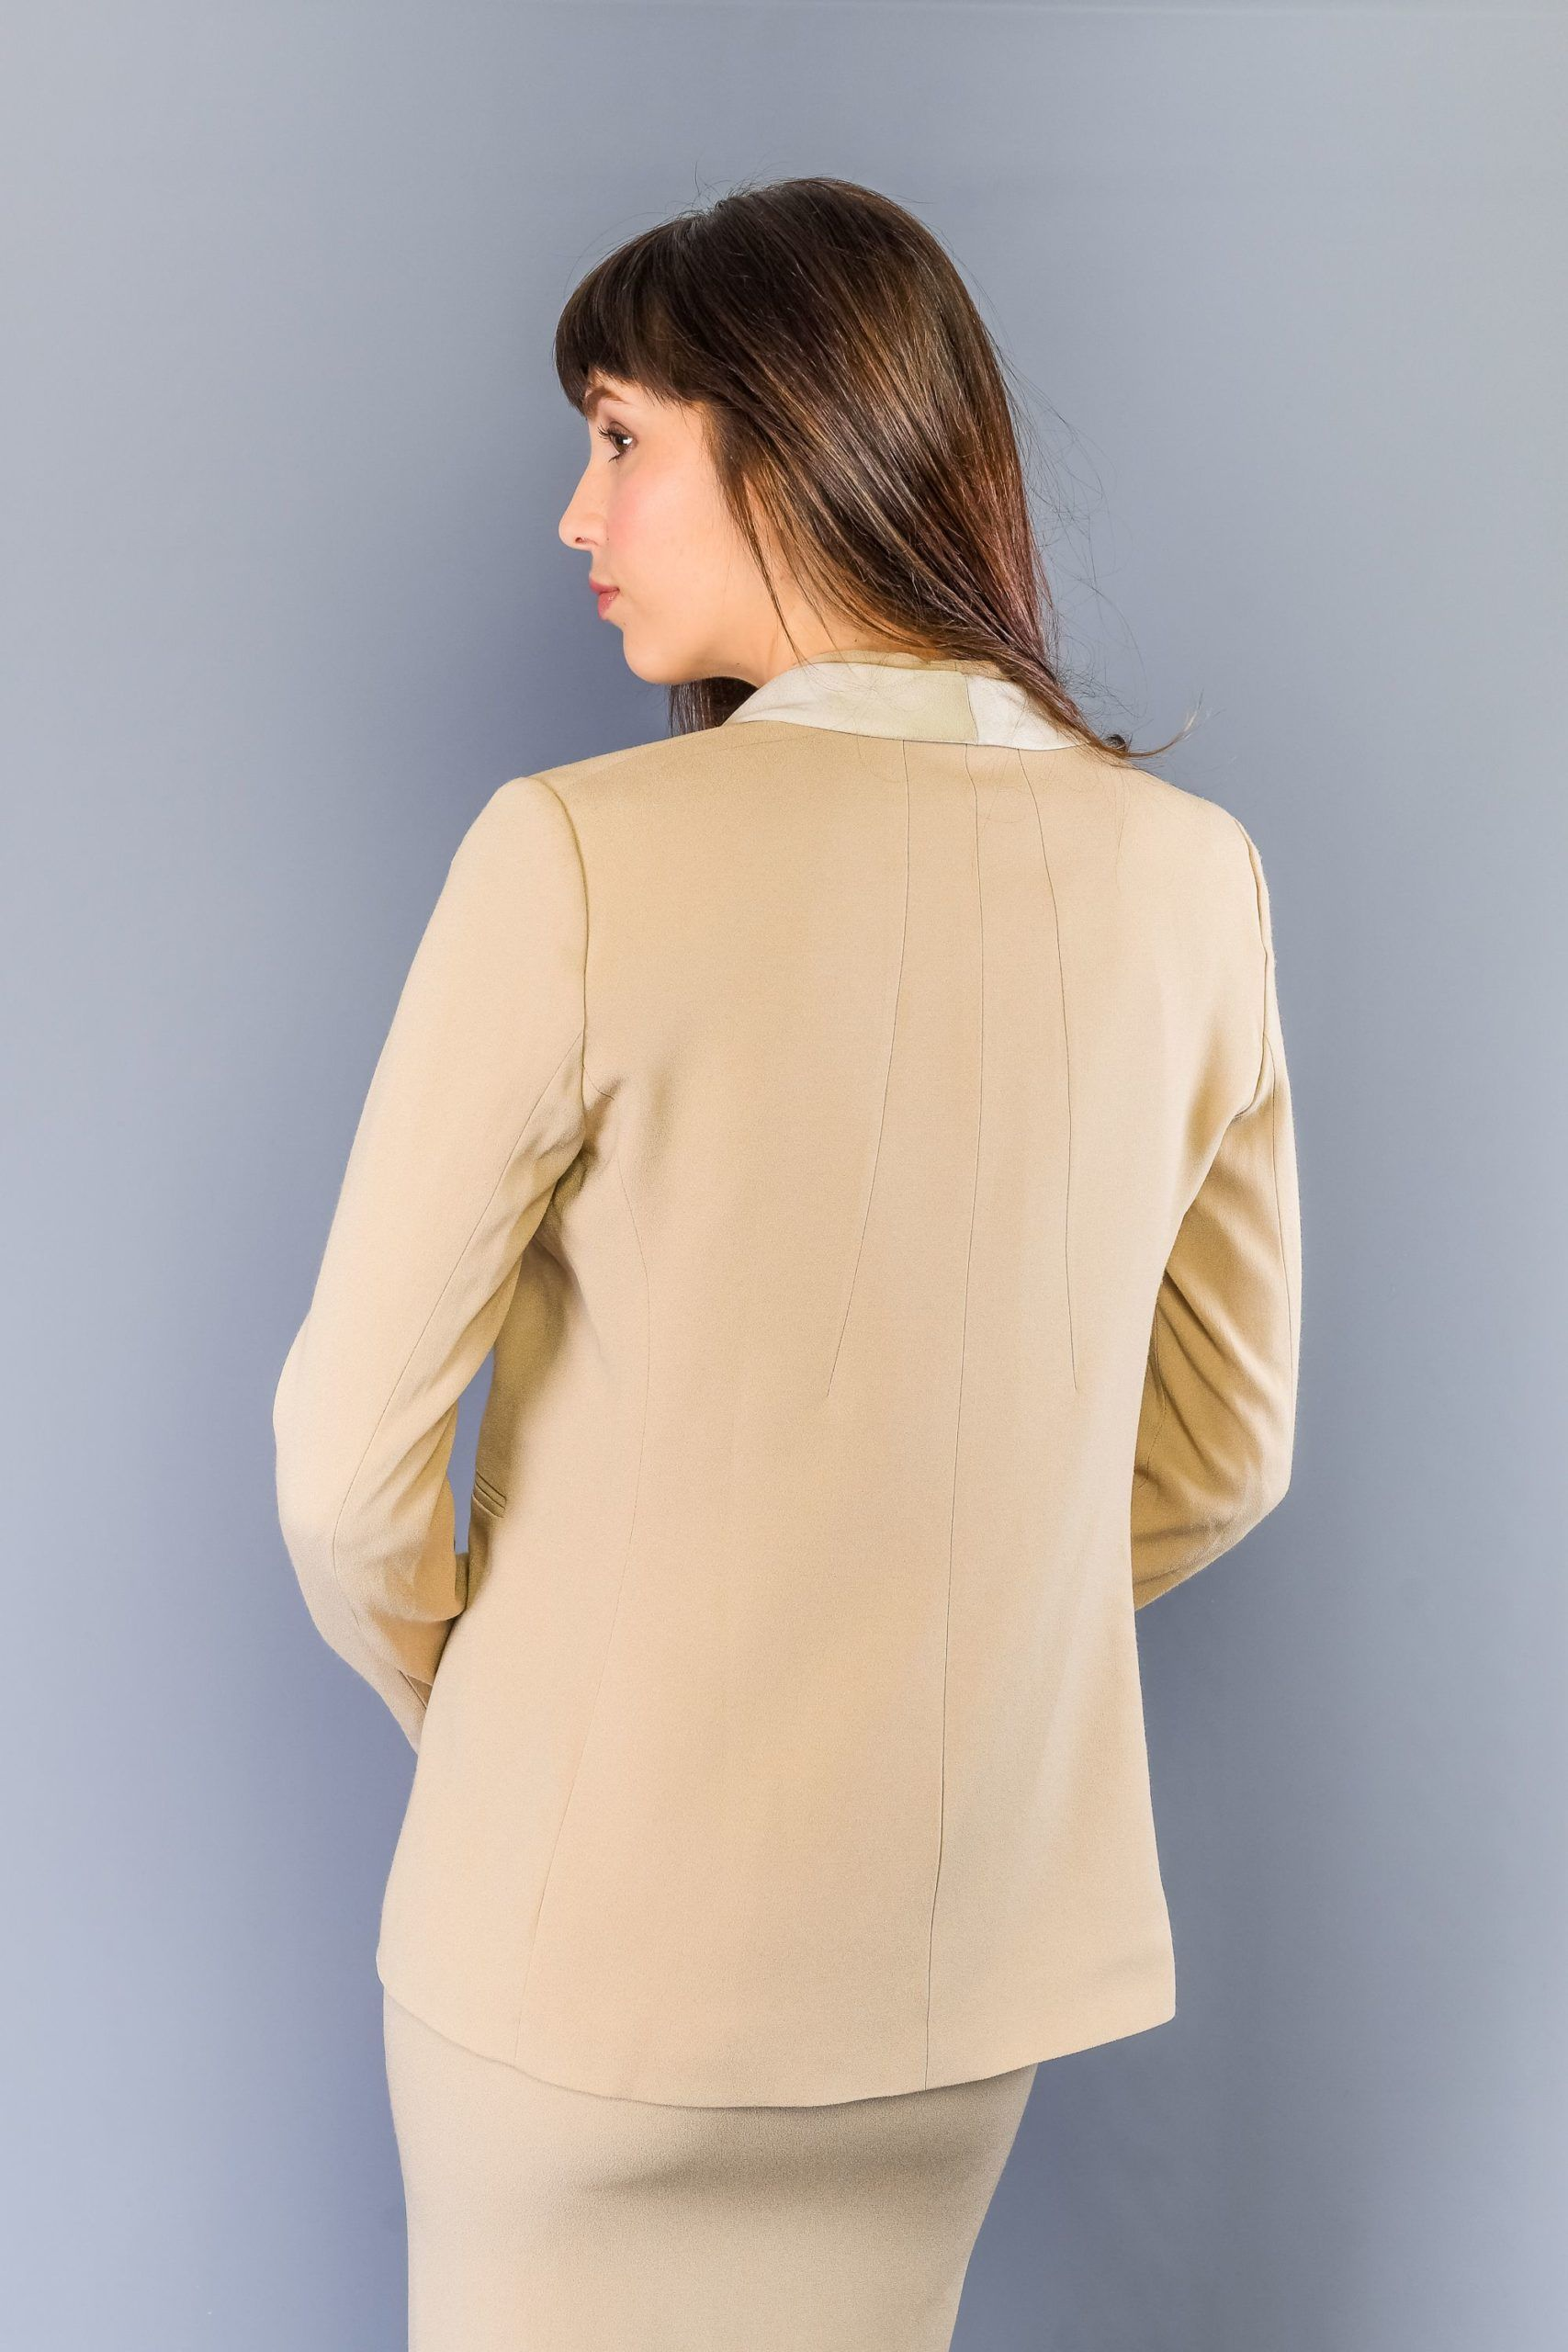 Twinset Rafia Jackets & Coat